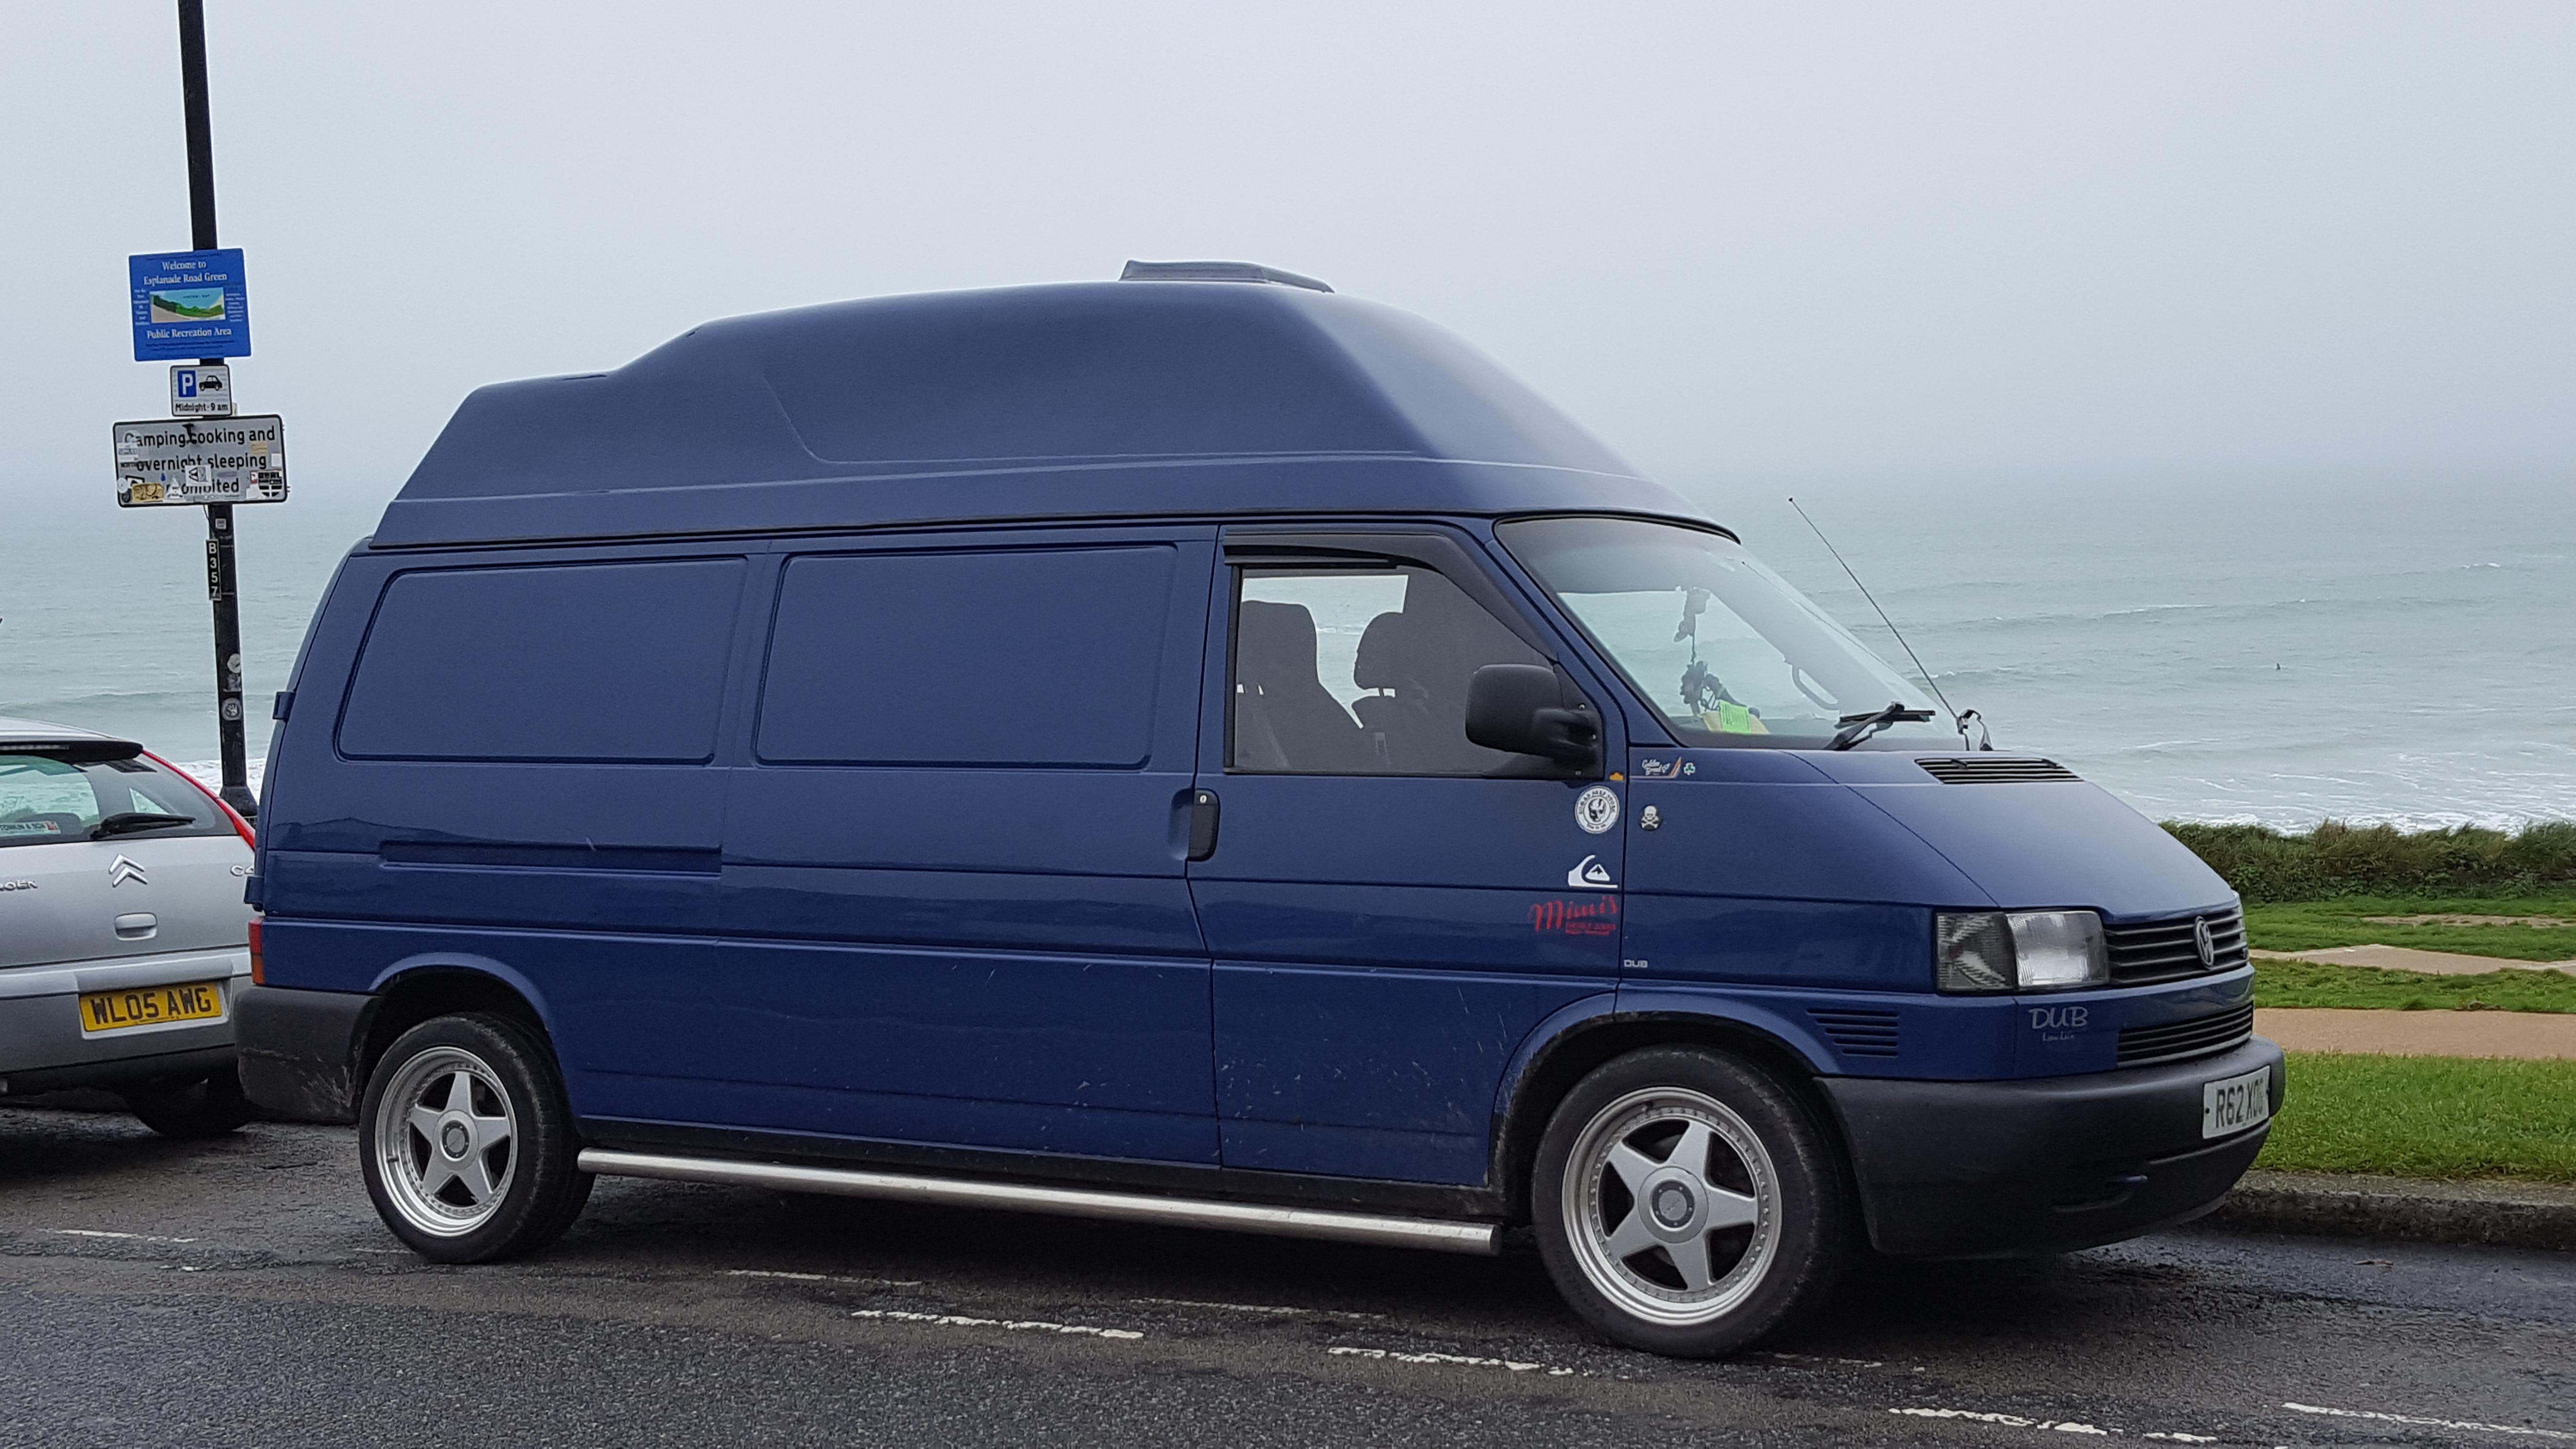 Fibreglass Grp High Top Roofs For Vw T4 Vans Shapes Grp